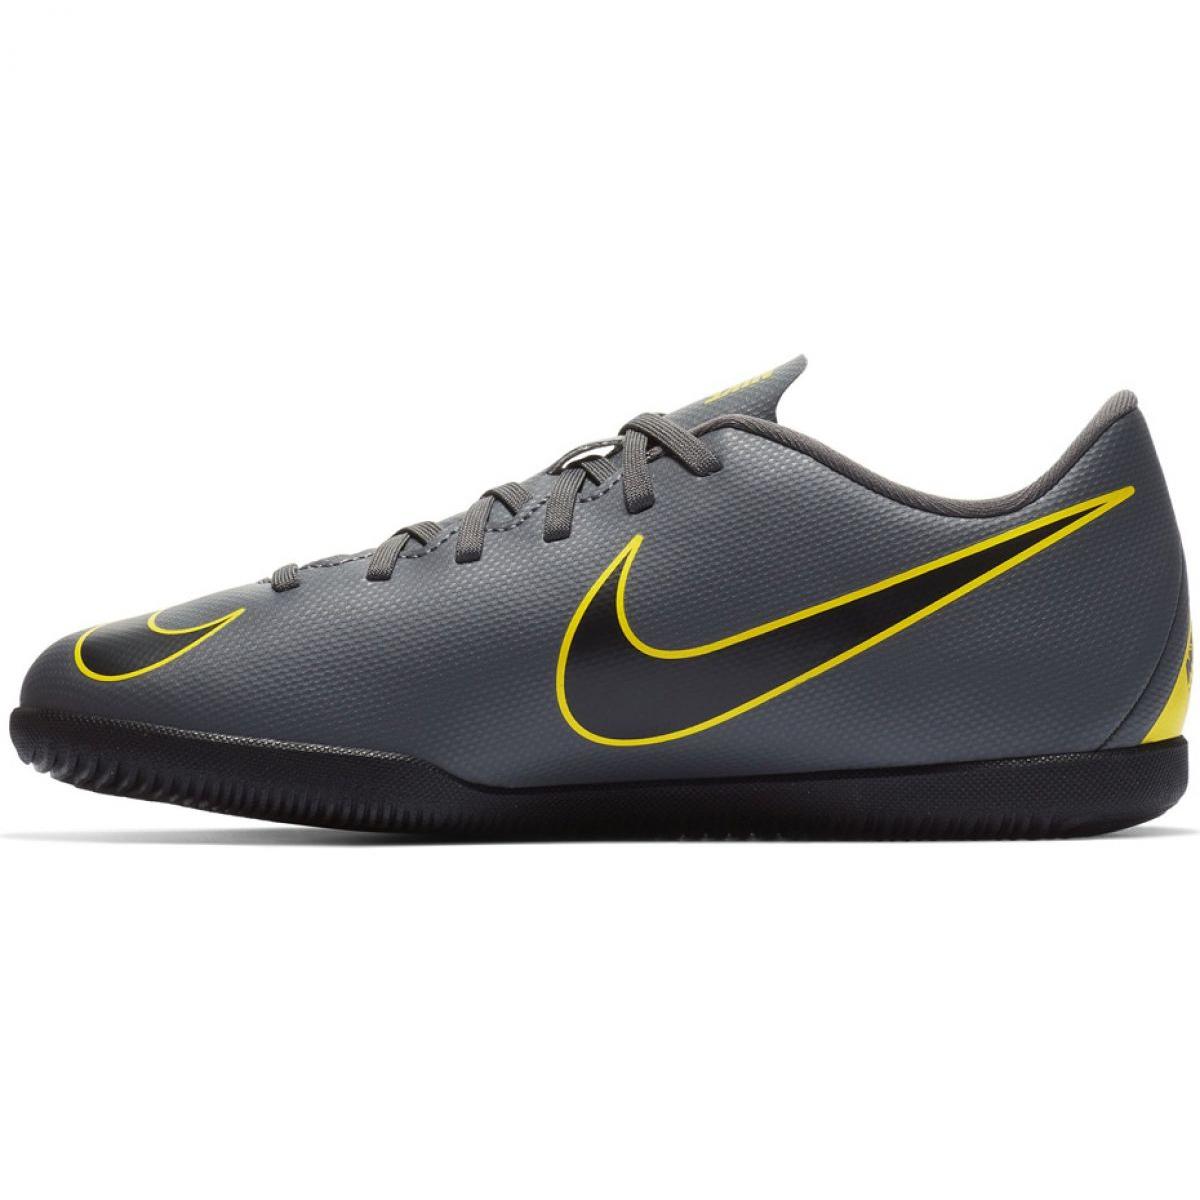 Zapatos de interior Nike Mercurial Vapor X 12 Club Ic Jr AH7354 070 gris gris plata